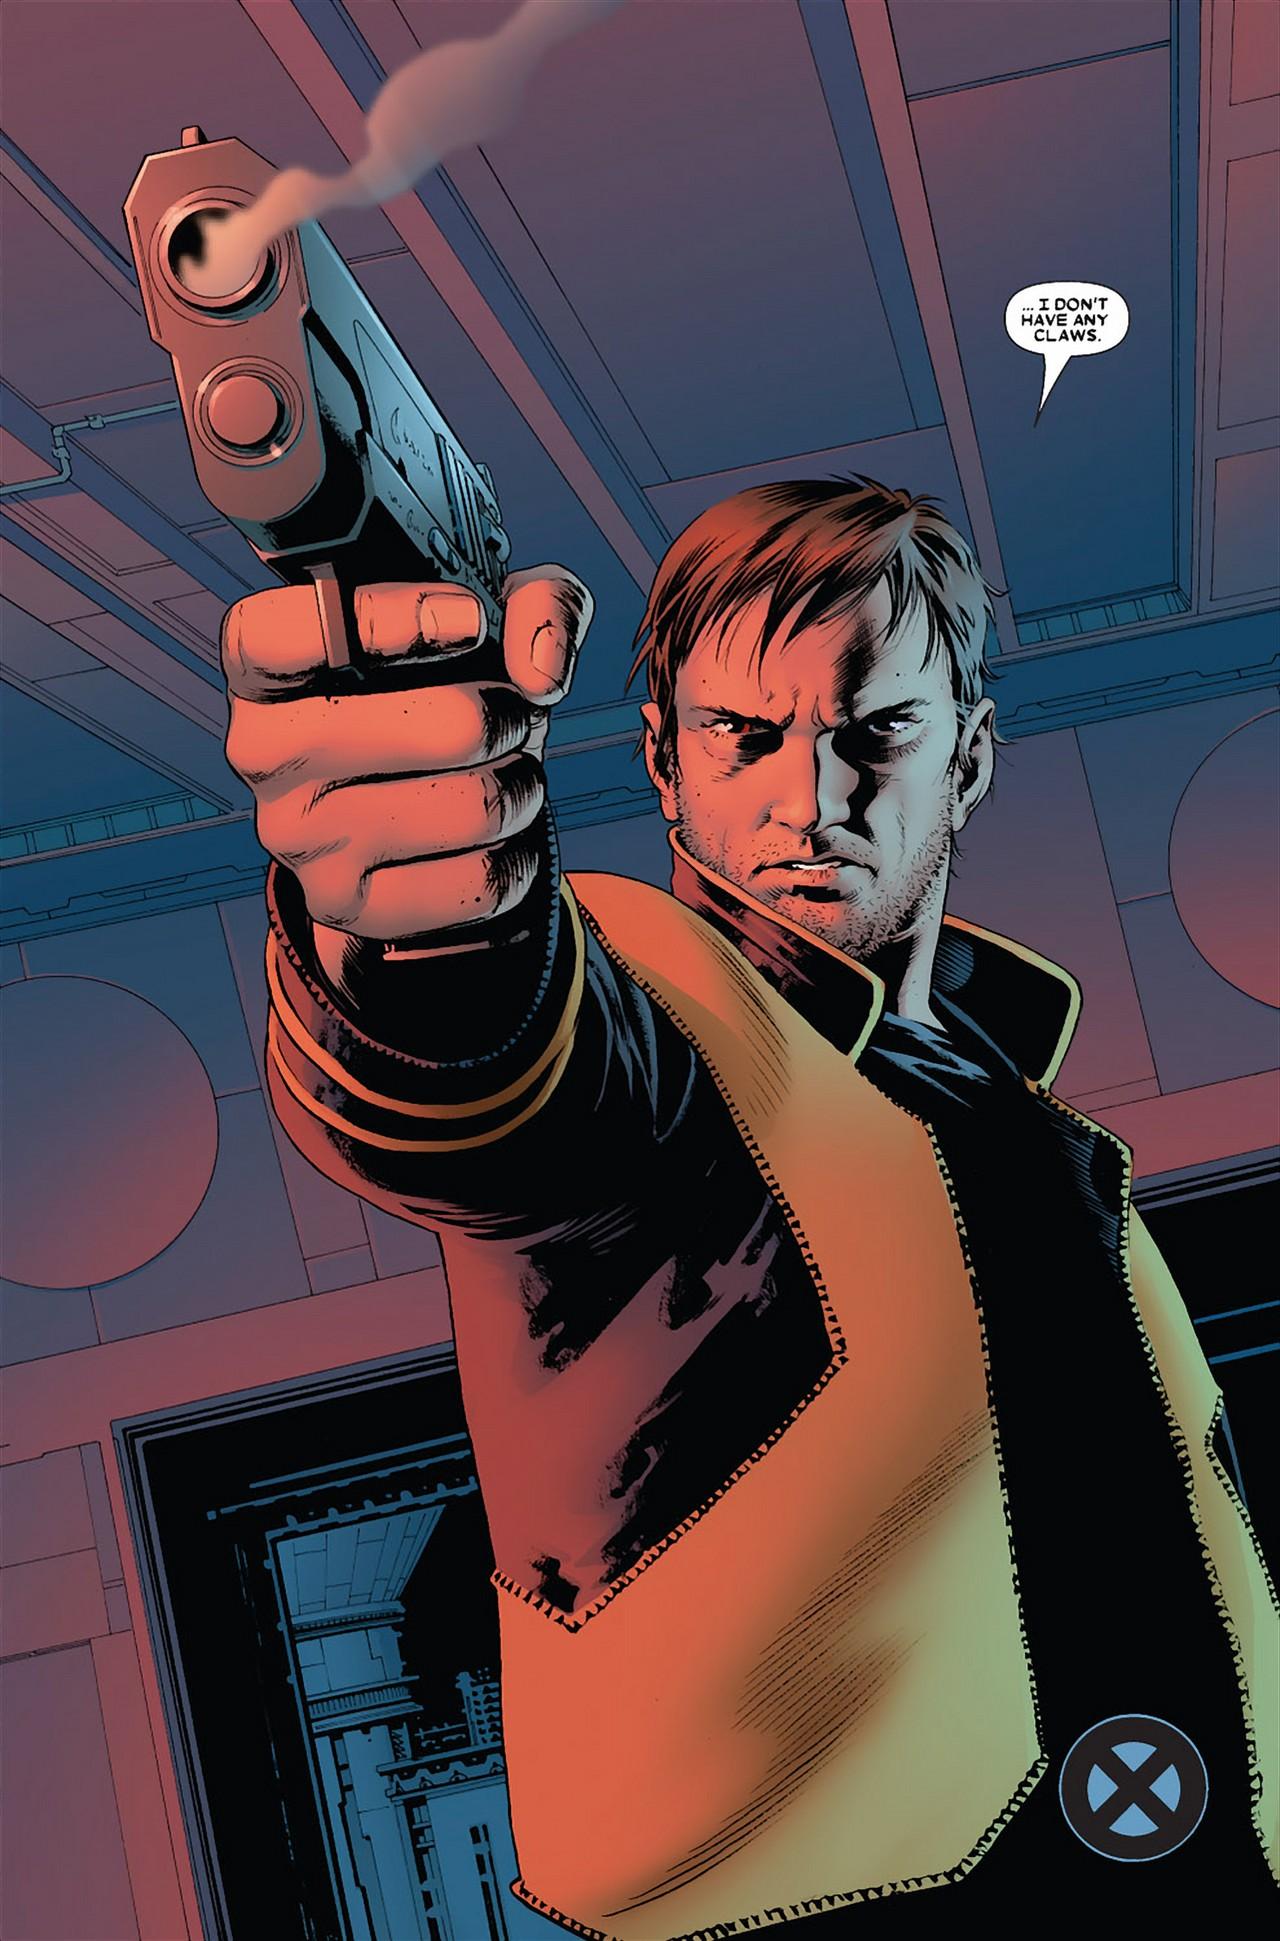 Cyclops (Astonishing X-Men Vol 3 #17)